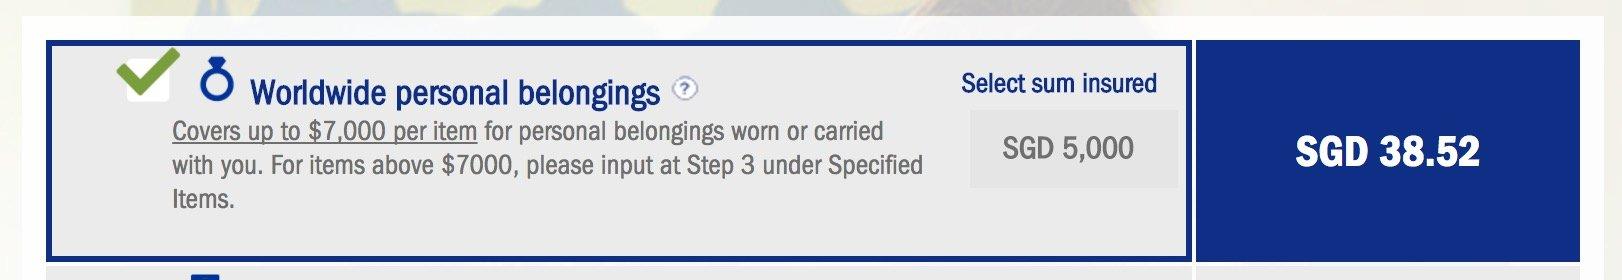 AXA home insurance personal belongings select sum.jpg